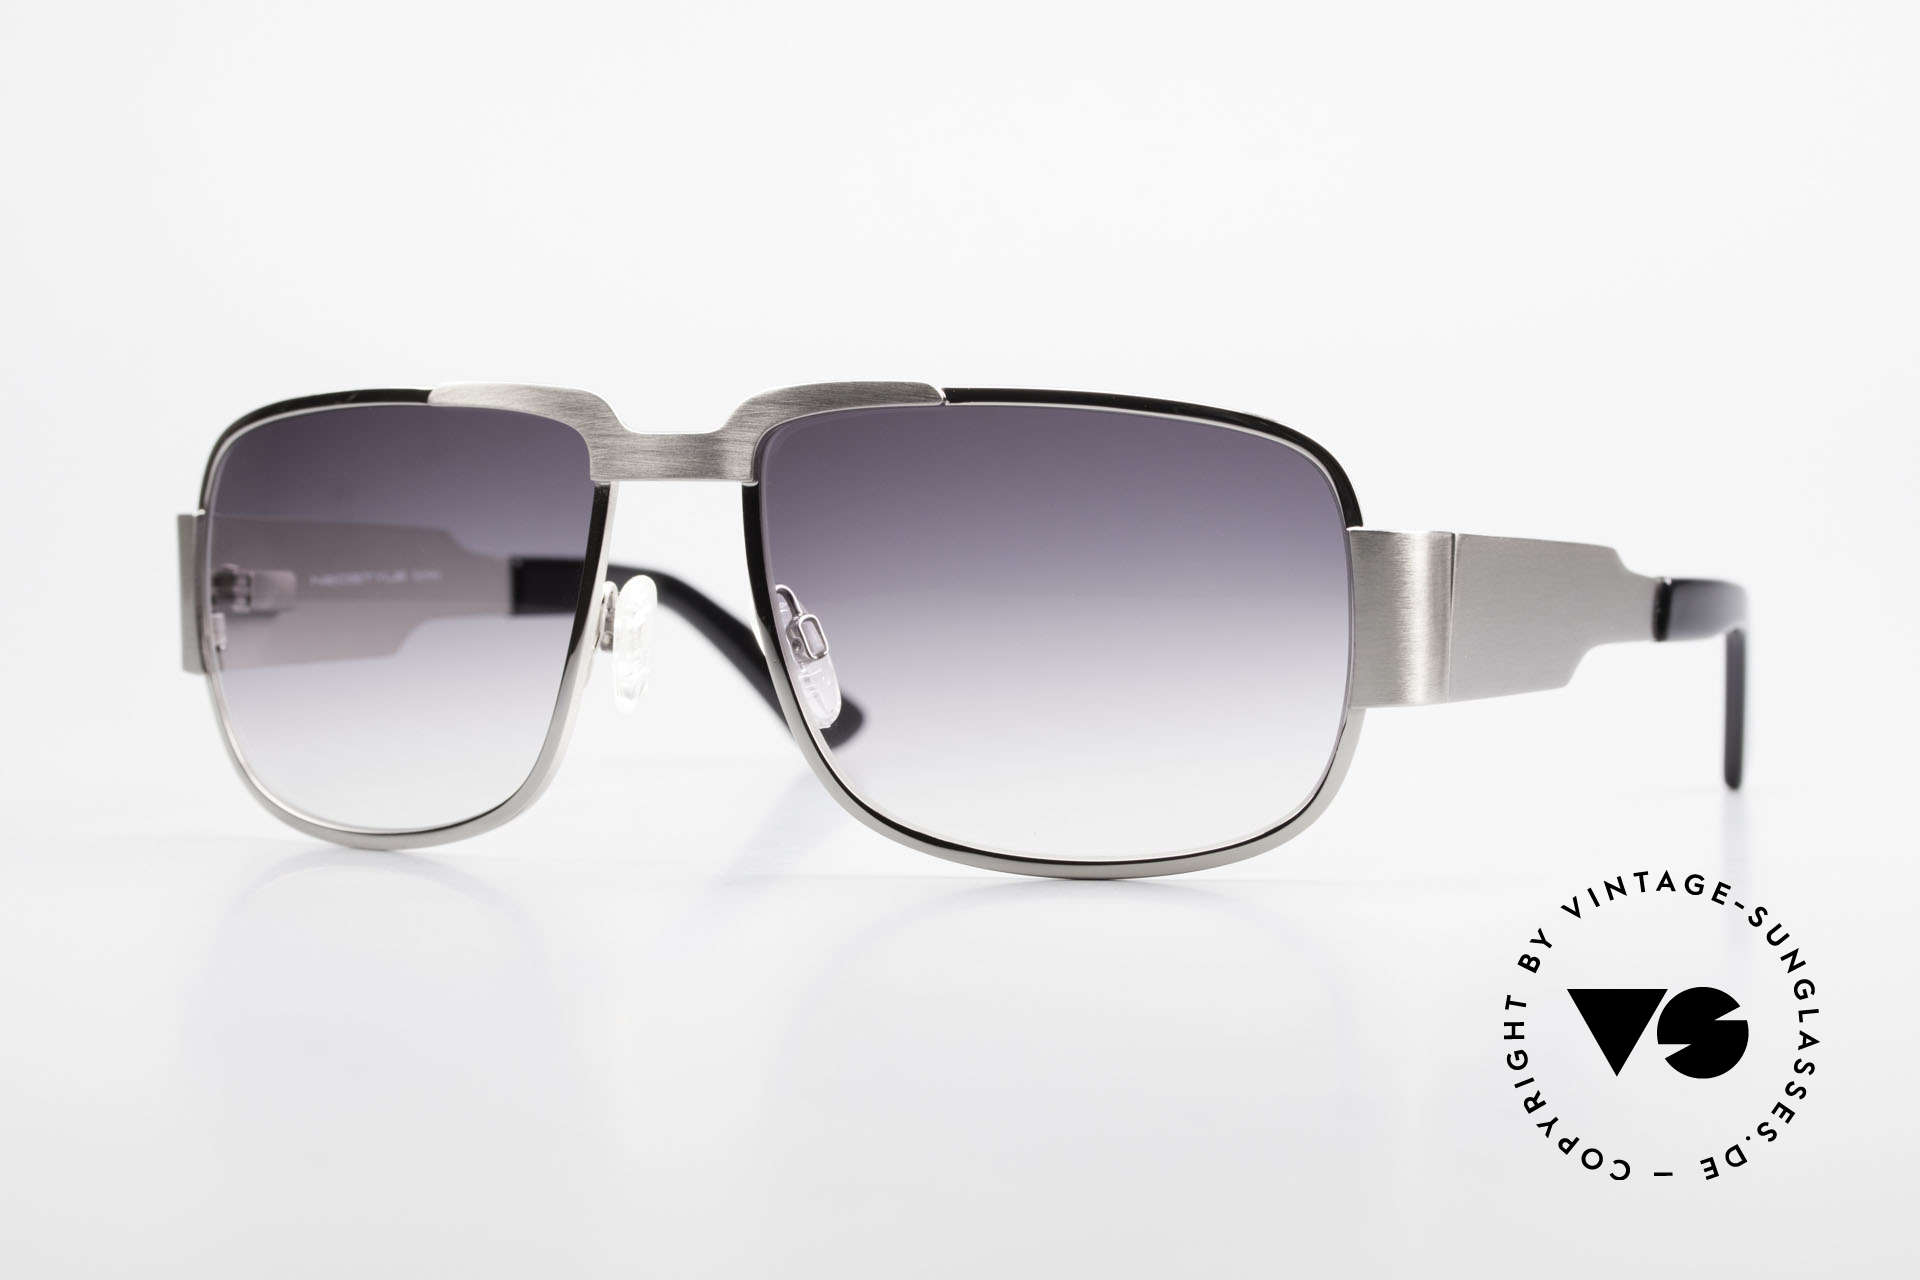 Neostyle Nautic 2 Elvis Presley Sunglasses, Neostyle NAUTIC 2 = the ELVIS sunglasses par excellence, Made for Men